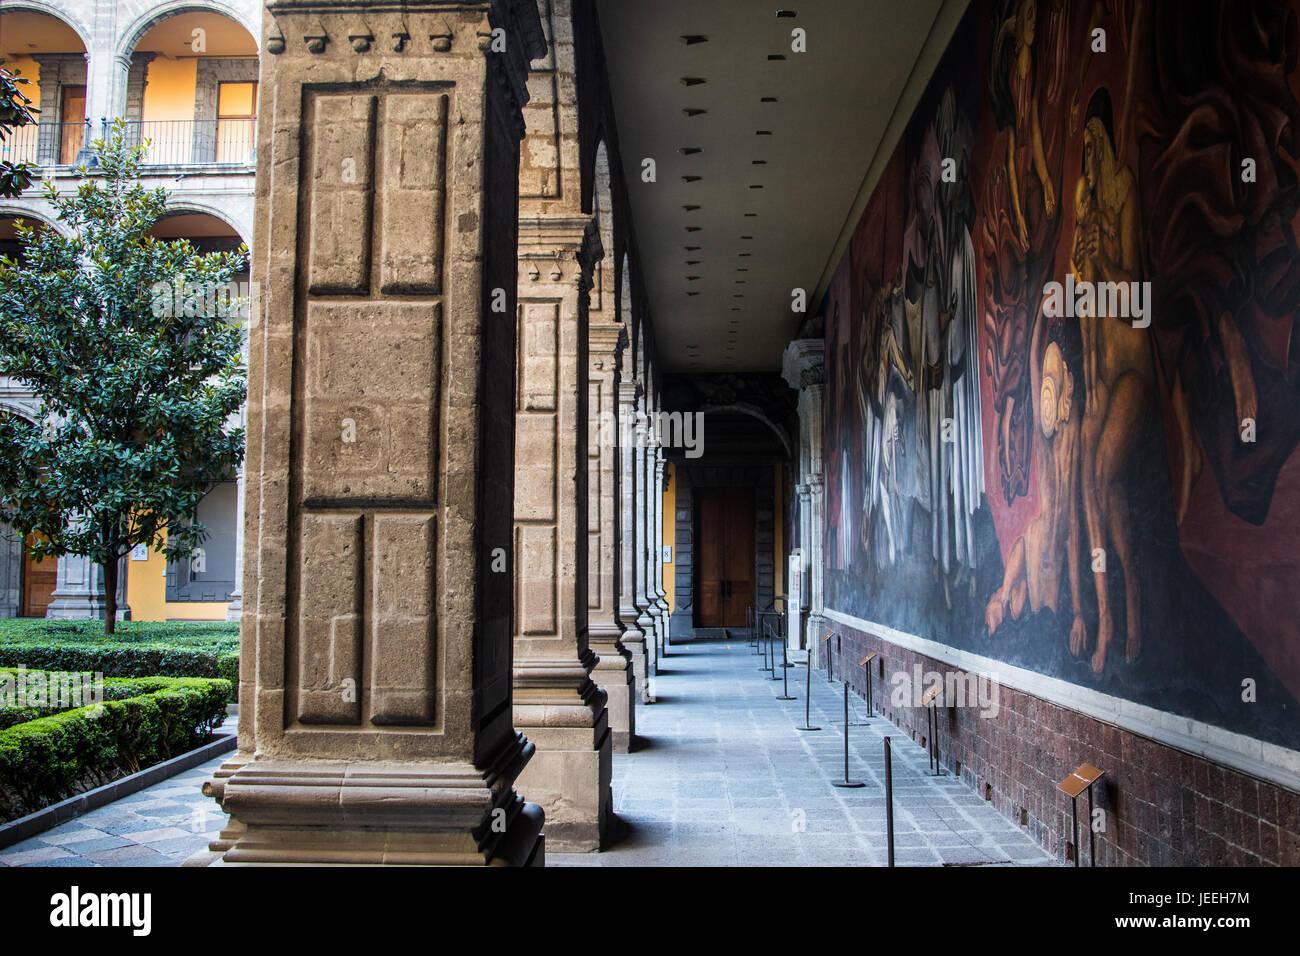 Murals in a courtyard inside Antiguo Colegio de San Ildefonso, Mexico City, Mexico - Stock Image